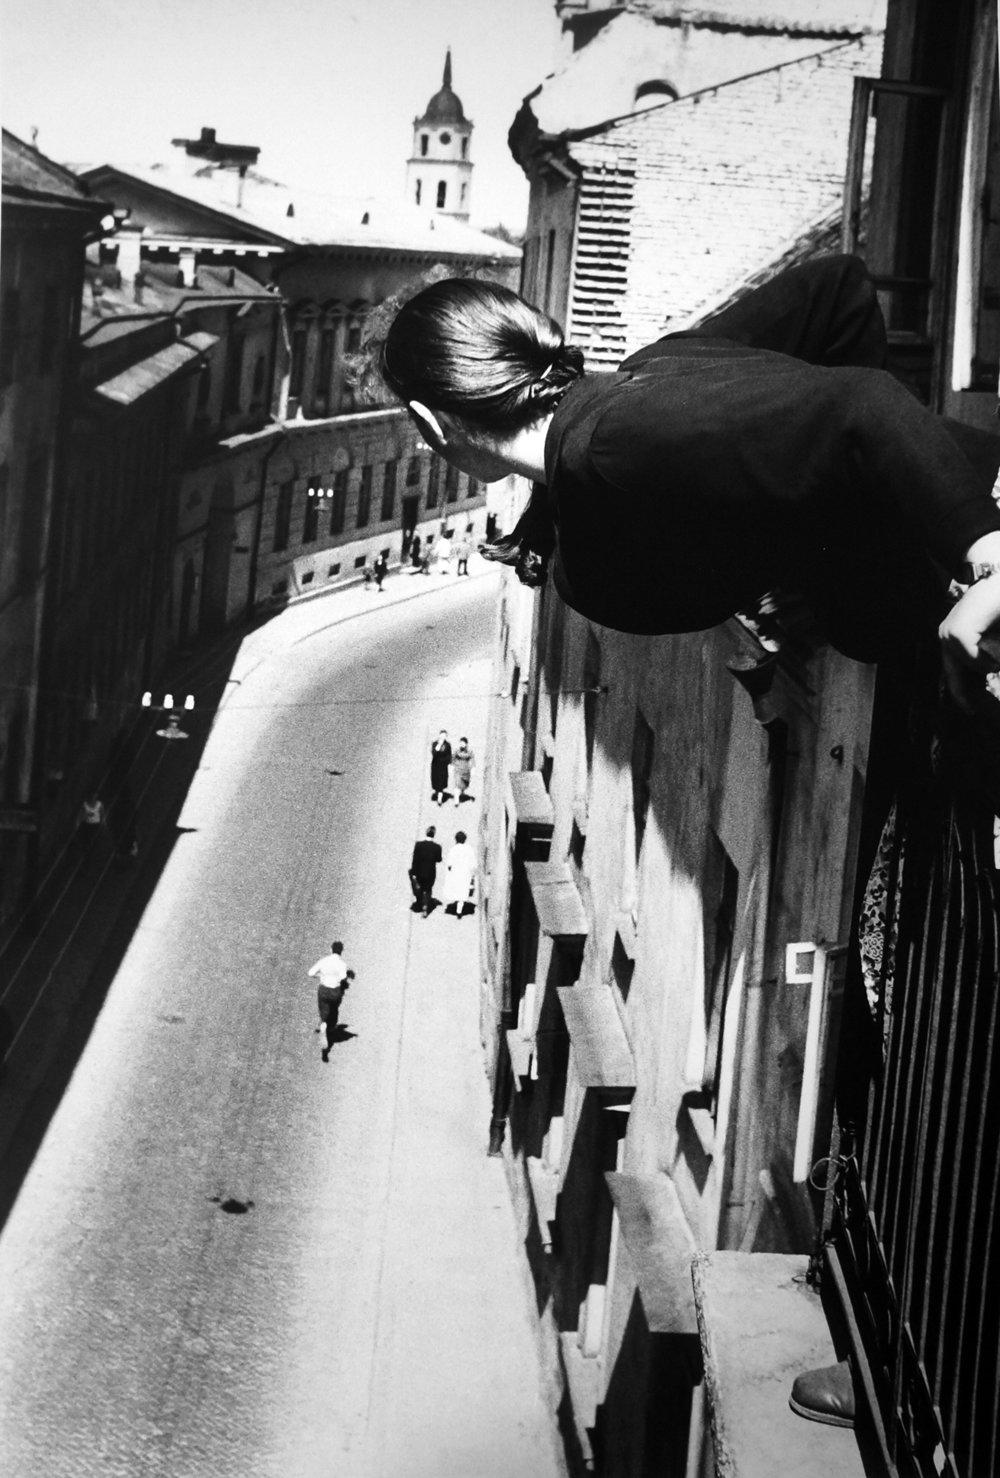 Gallery STP_Antanas SUtkus_Marathon on University Street_1959.JPG